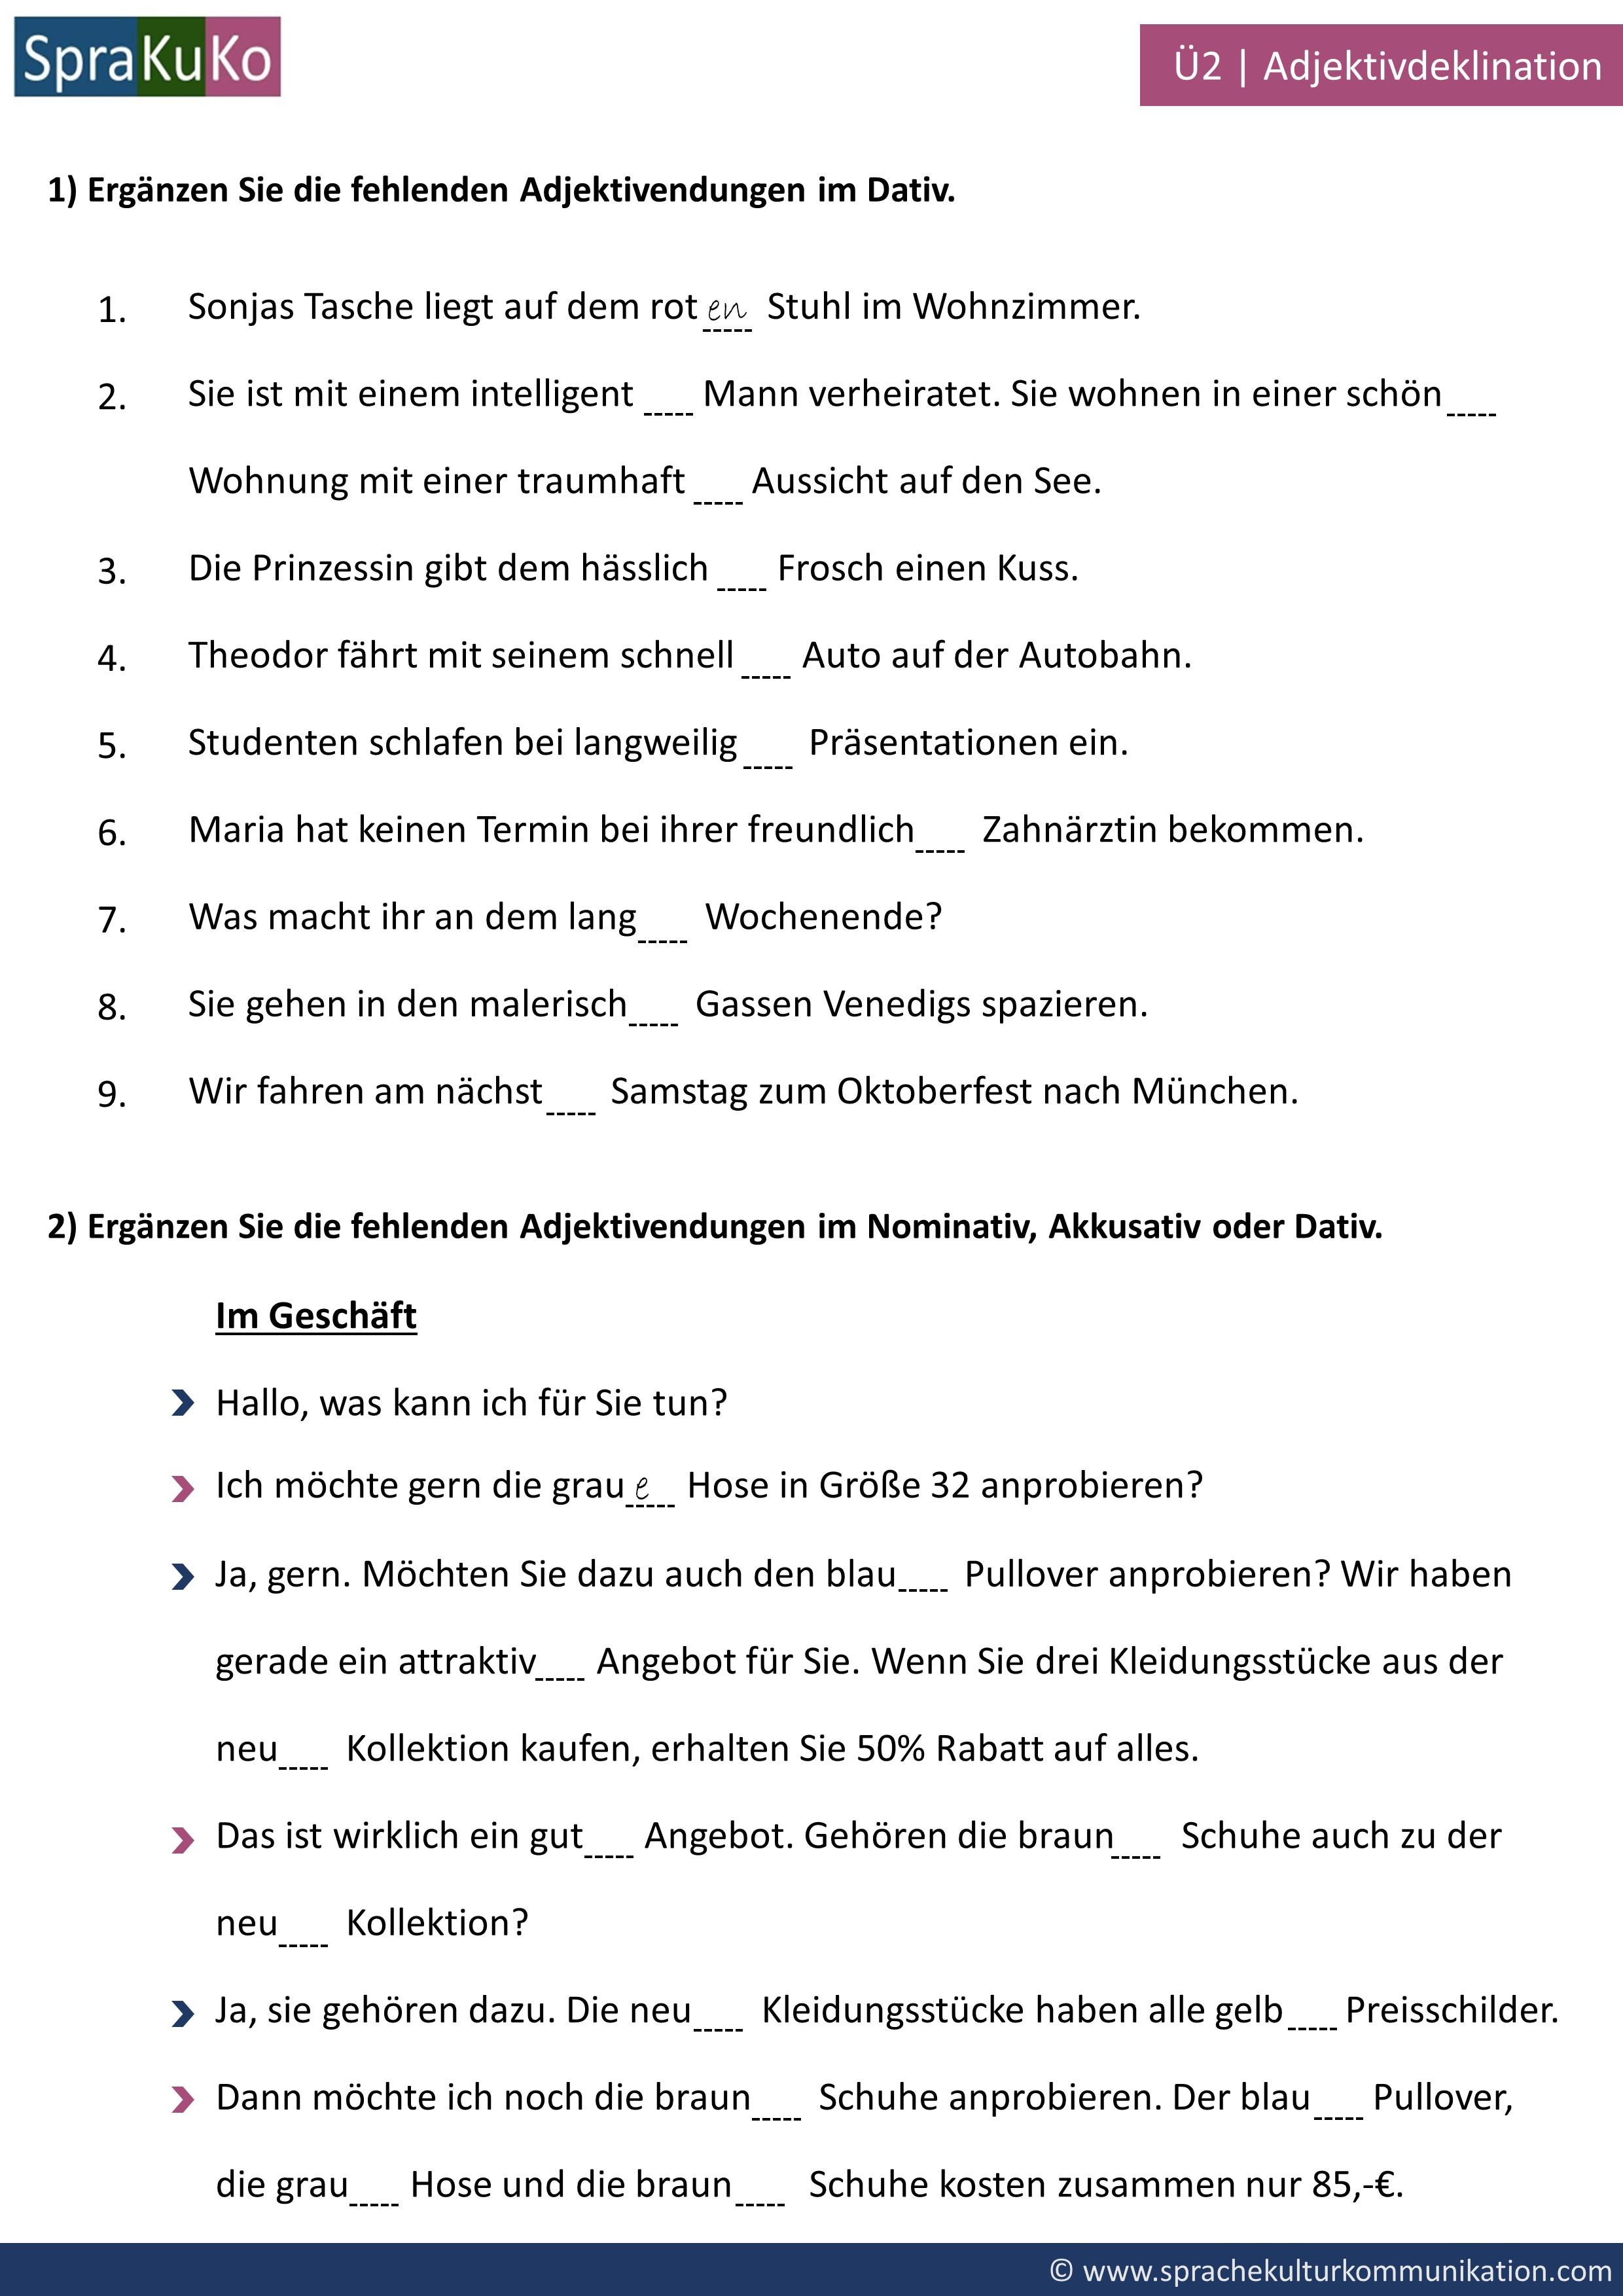 Ubung Zur Adjektivdeklination Im Nominativ Akkusativ Und